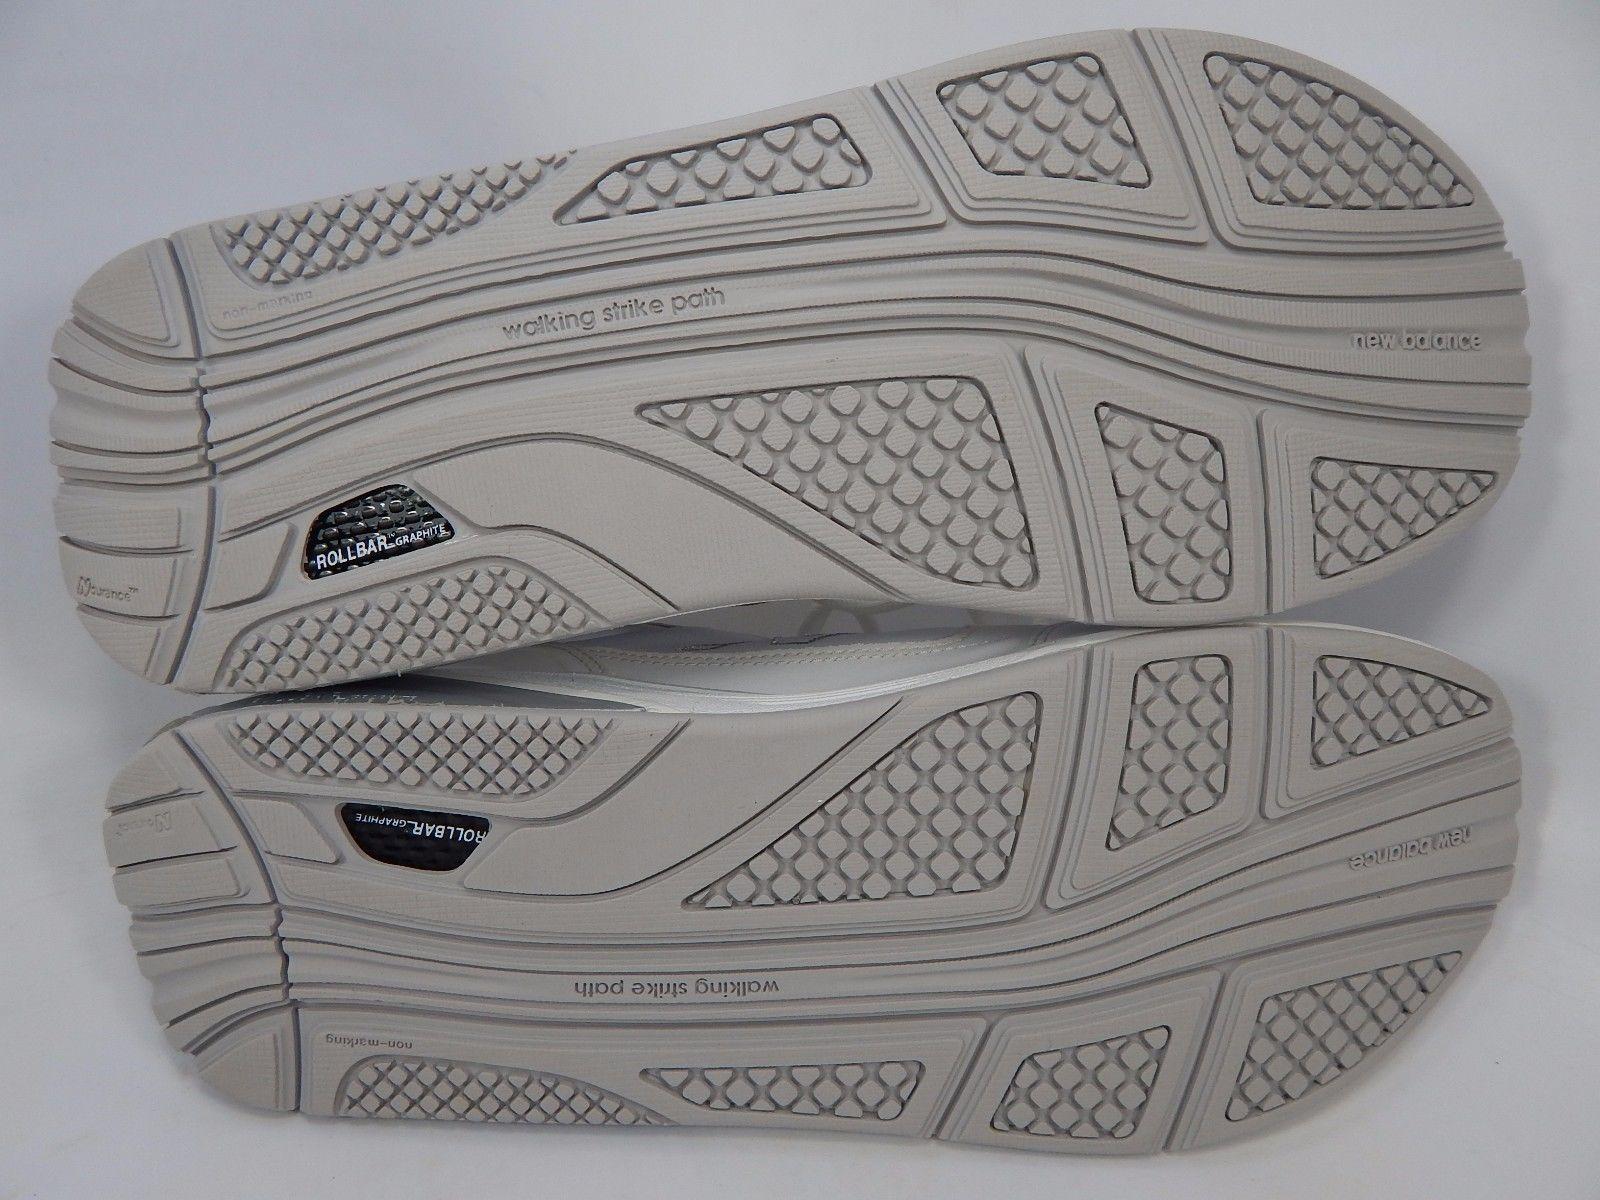 New Balance 928 Women's Walking Shoes Size US 12 M (B) EU 44 White WW928WT